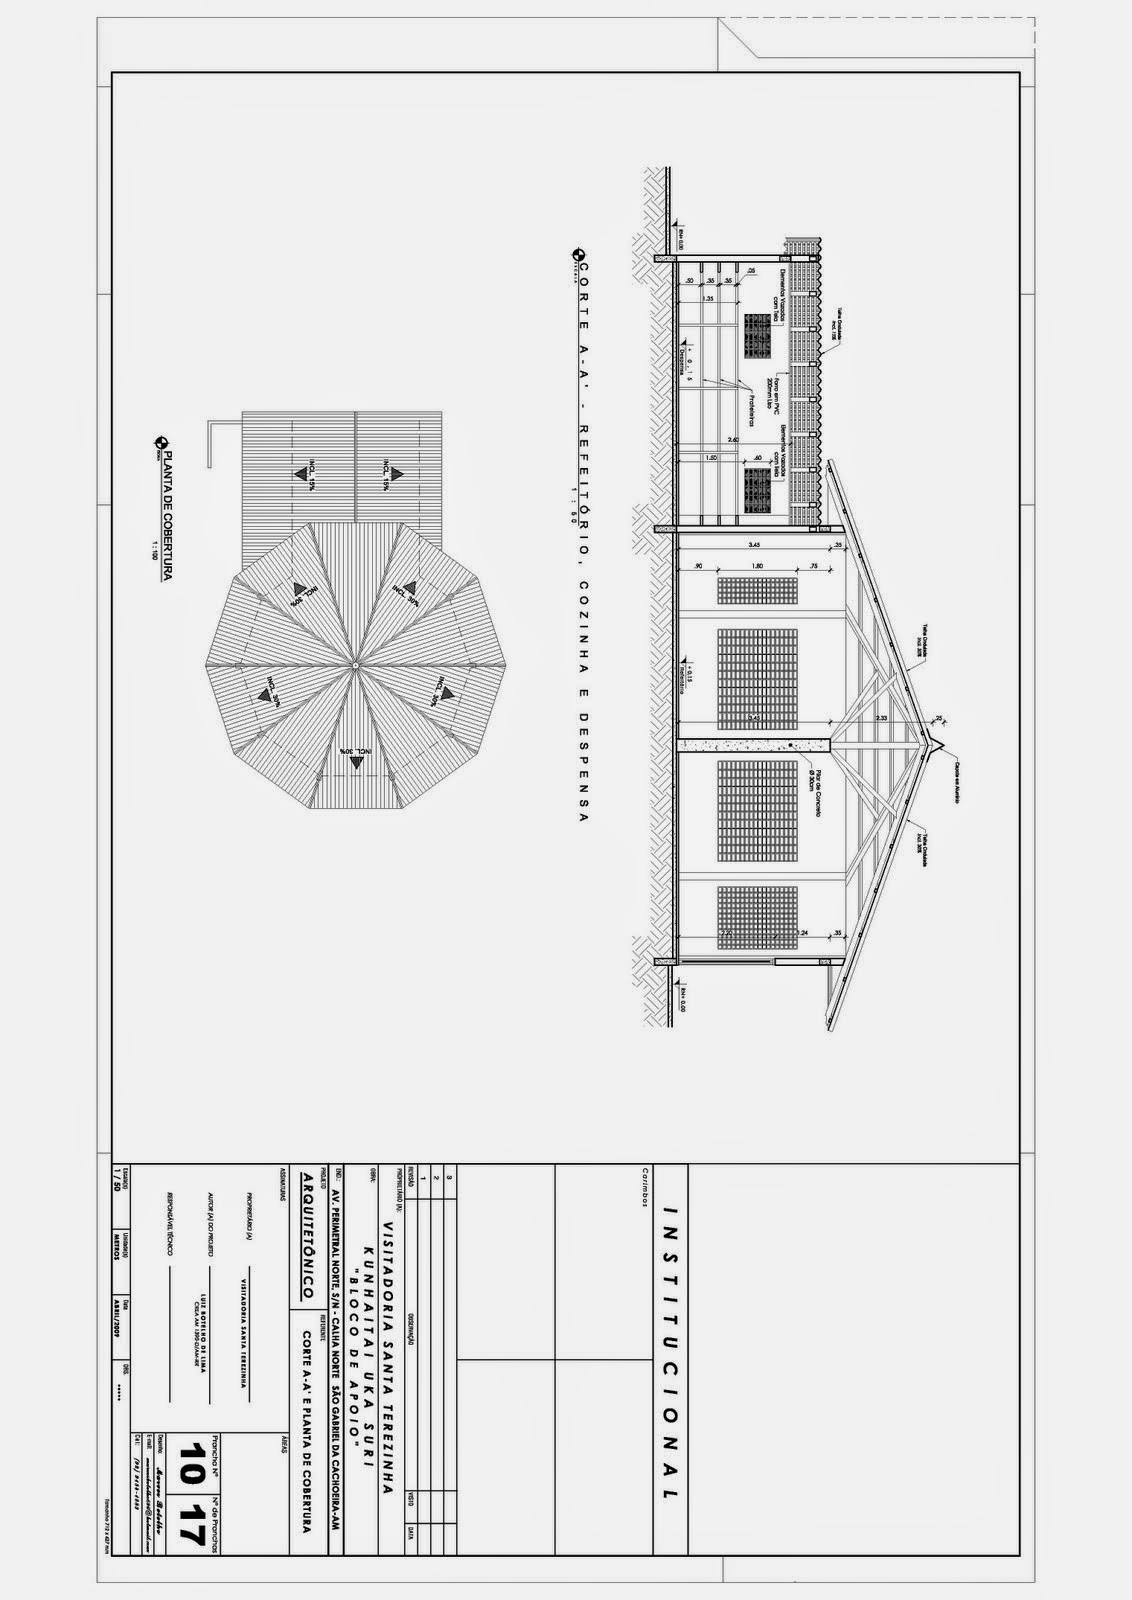 Projetos Religiosos: Projeto Religioso Planta Baixa Corte e Planta  #373737 1132 1600